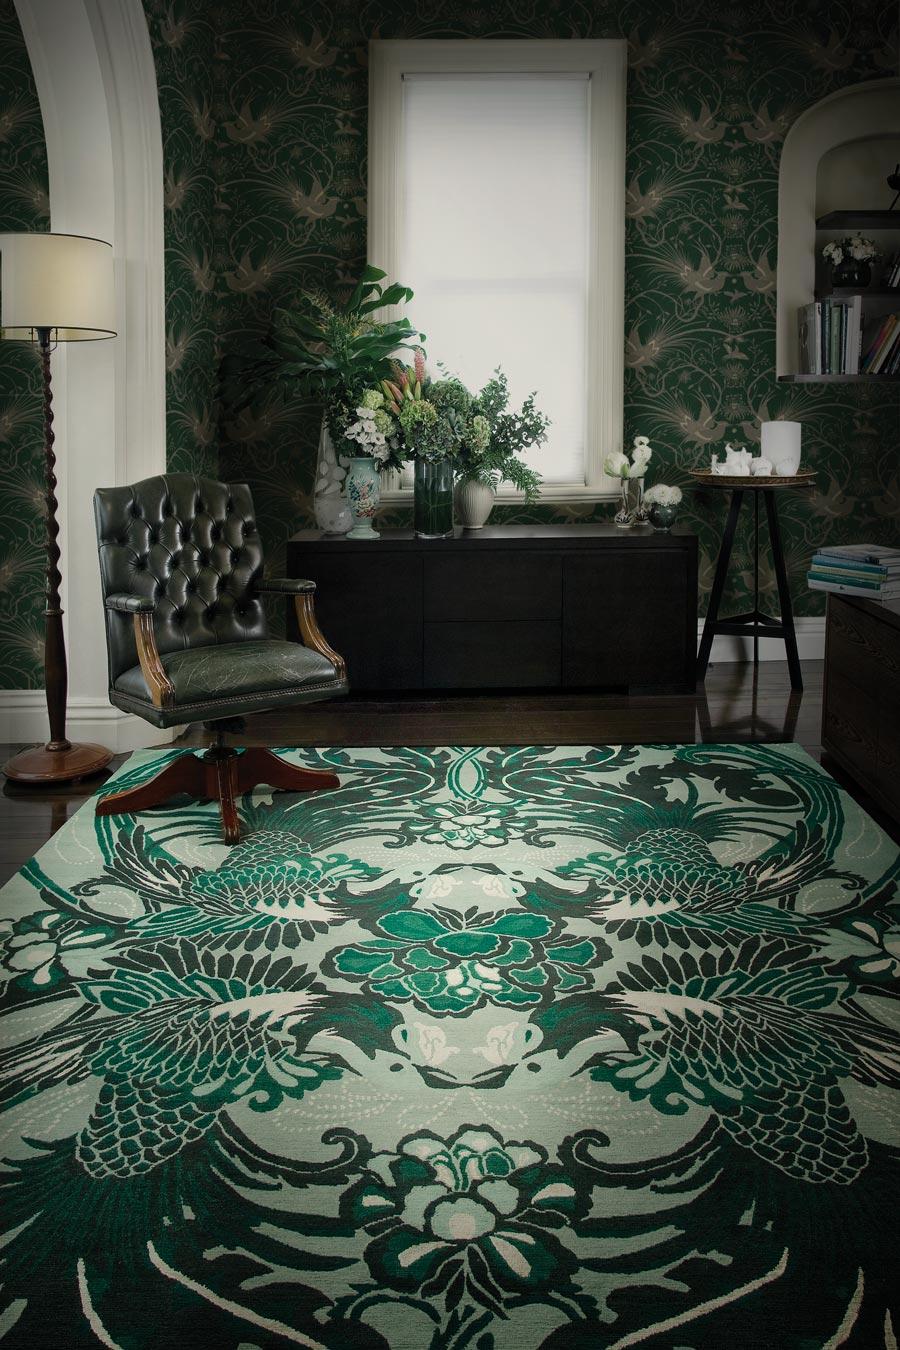 location shot of night bird rug by catherine martin green bird print